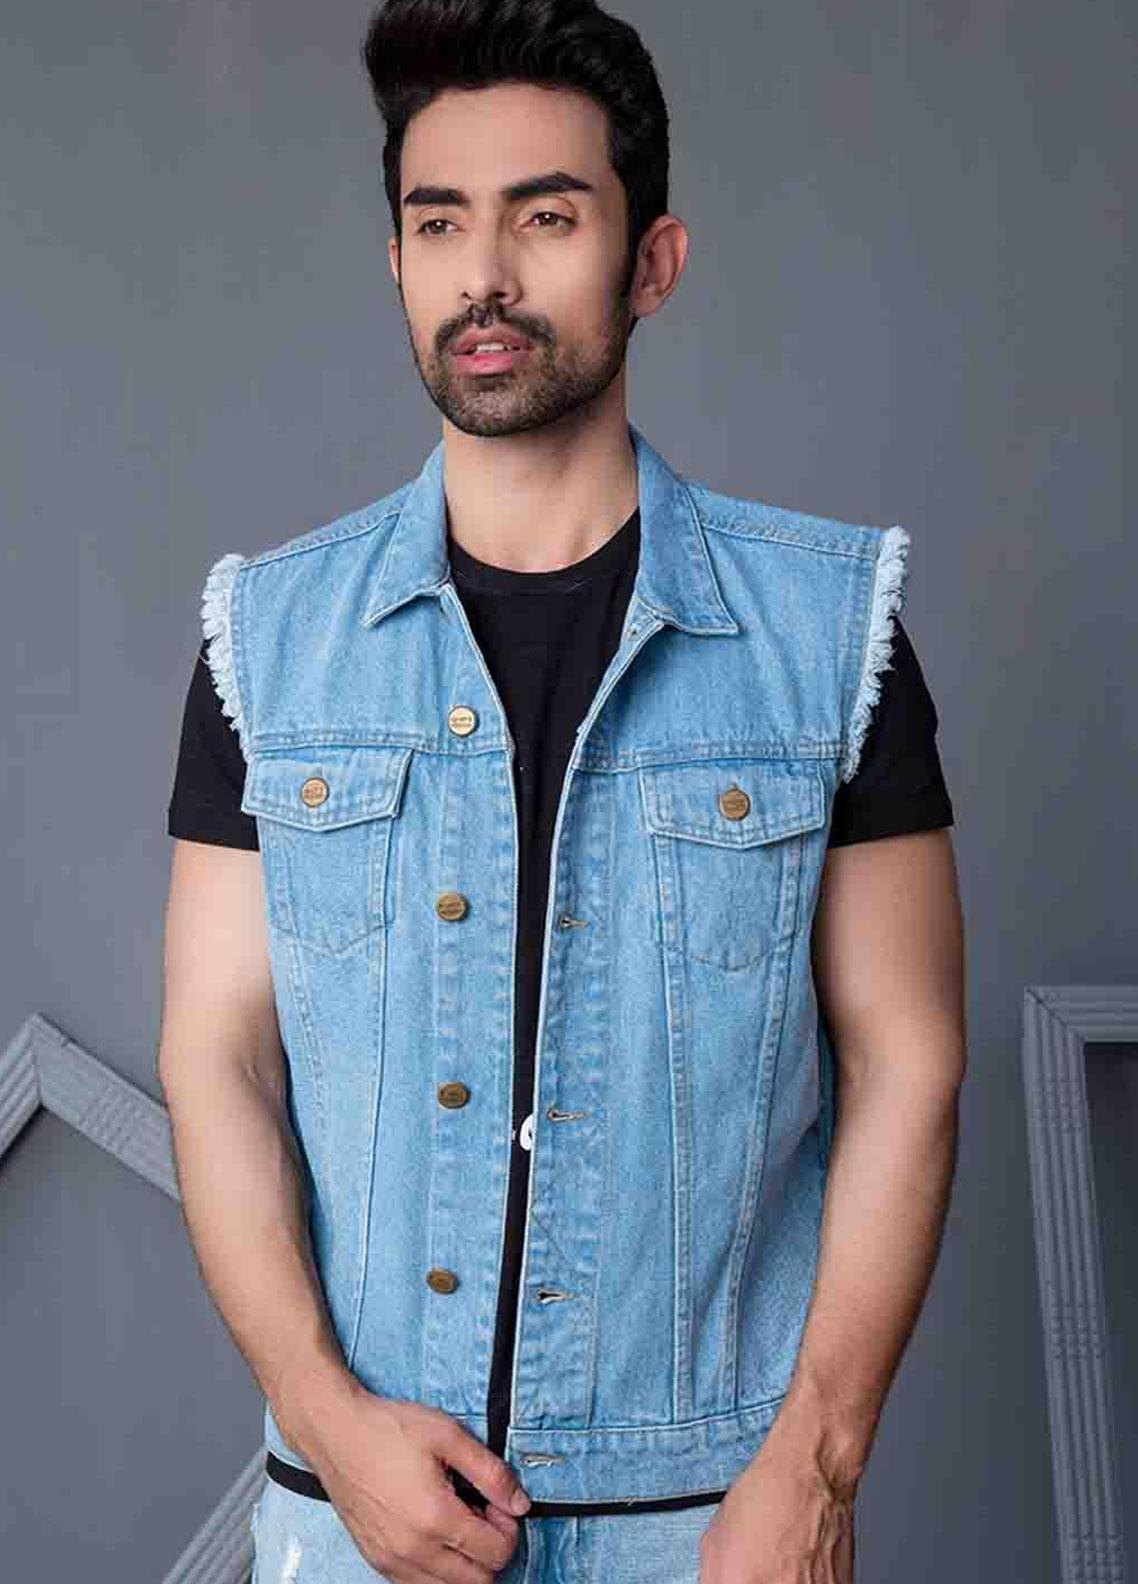 Ignite Wardrobe Denim Gilet Jackets for Men -  IG20JKM 001